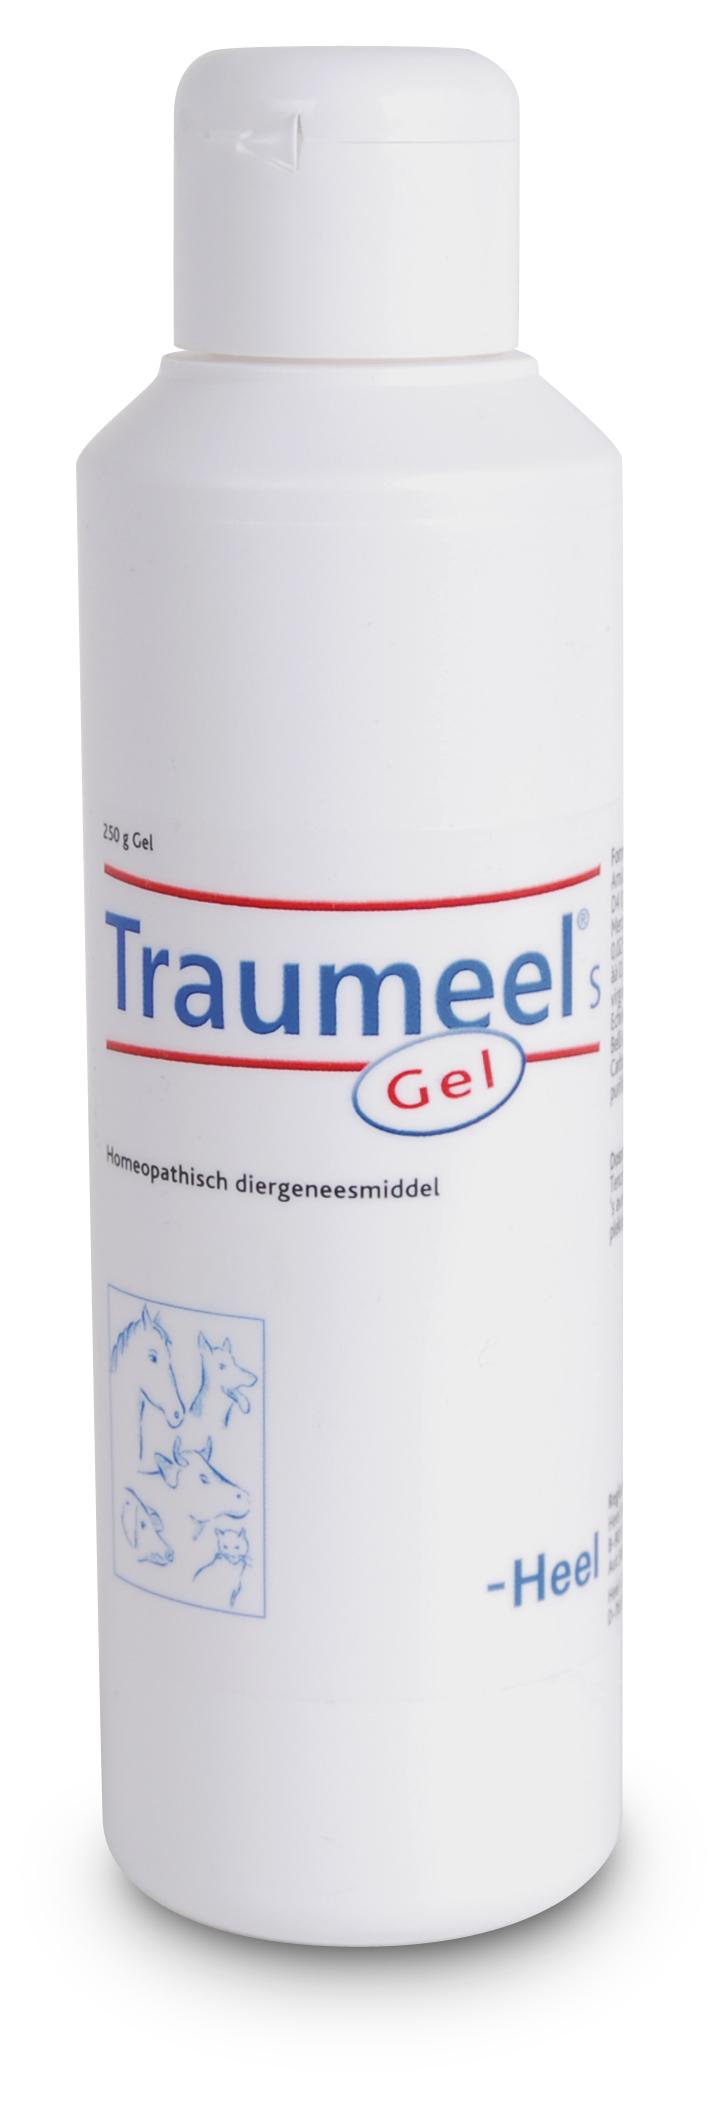 Sectolin Traumeel S Gel 250 gram